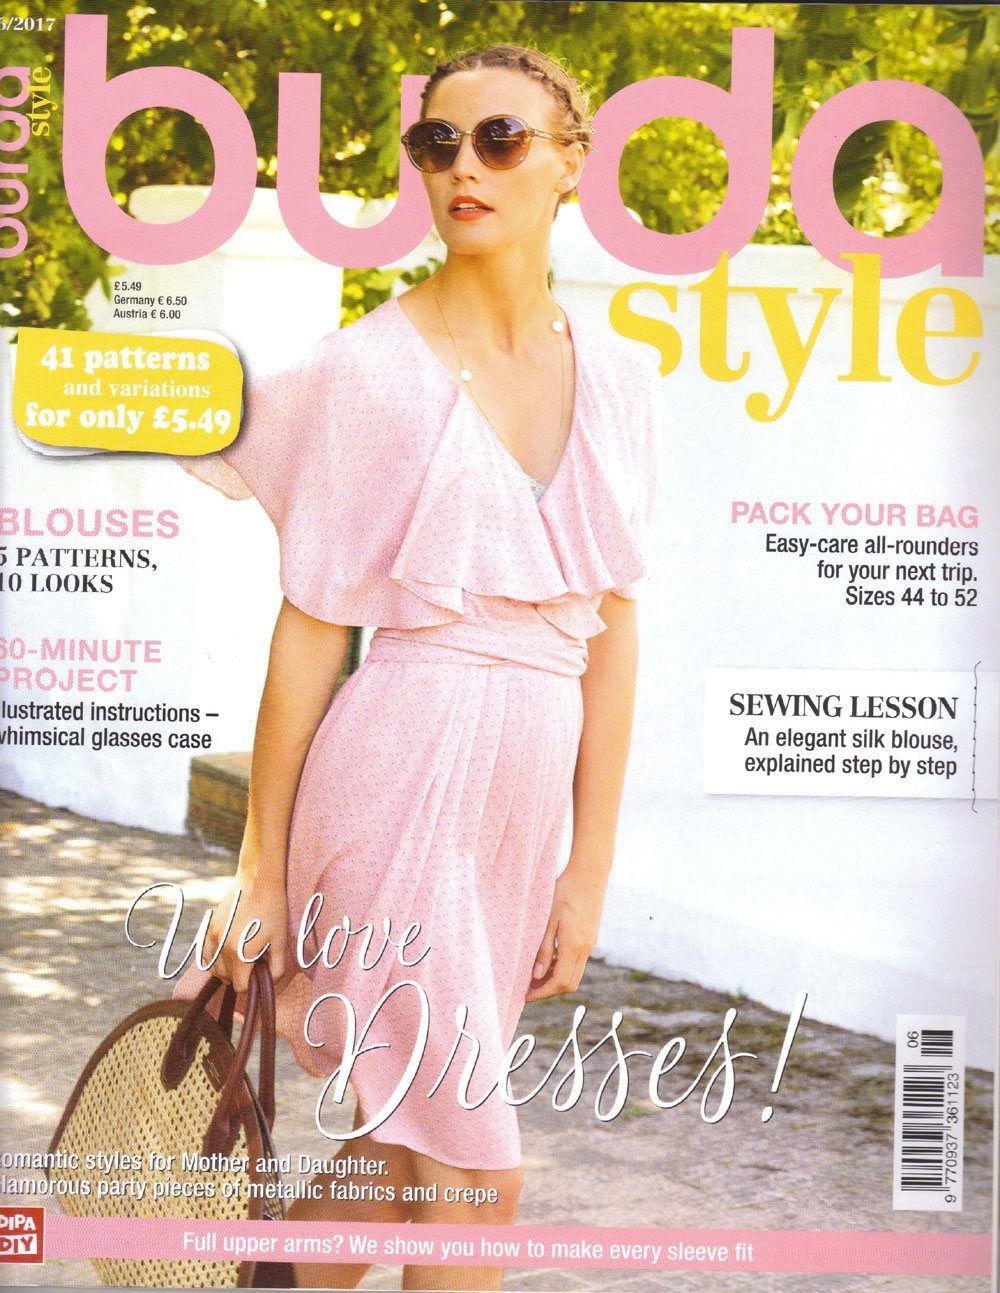 Burda style magazine 62017 english sewing patterns by burda style magazine 62017 english sewing patterns by honeyjamsuniques on etsy jeuxipadfo Image collections